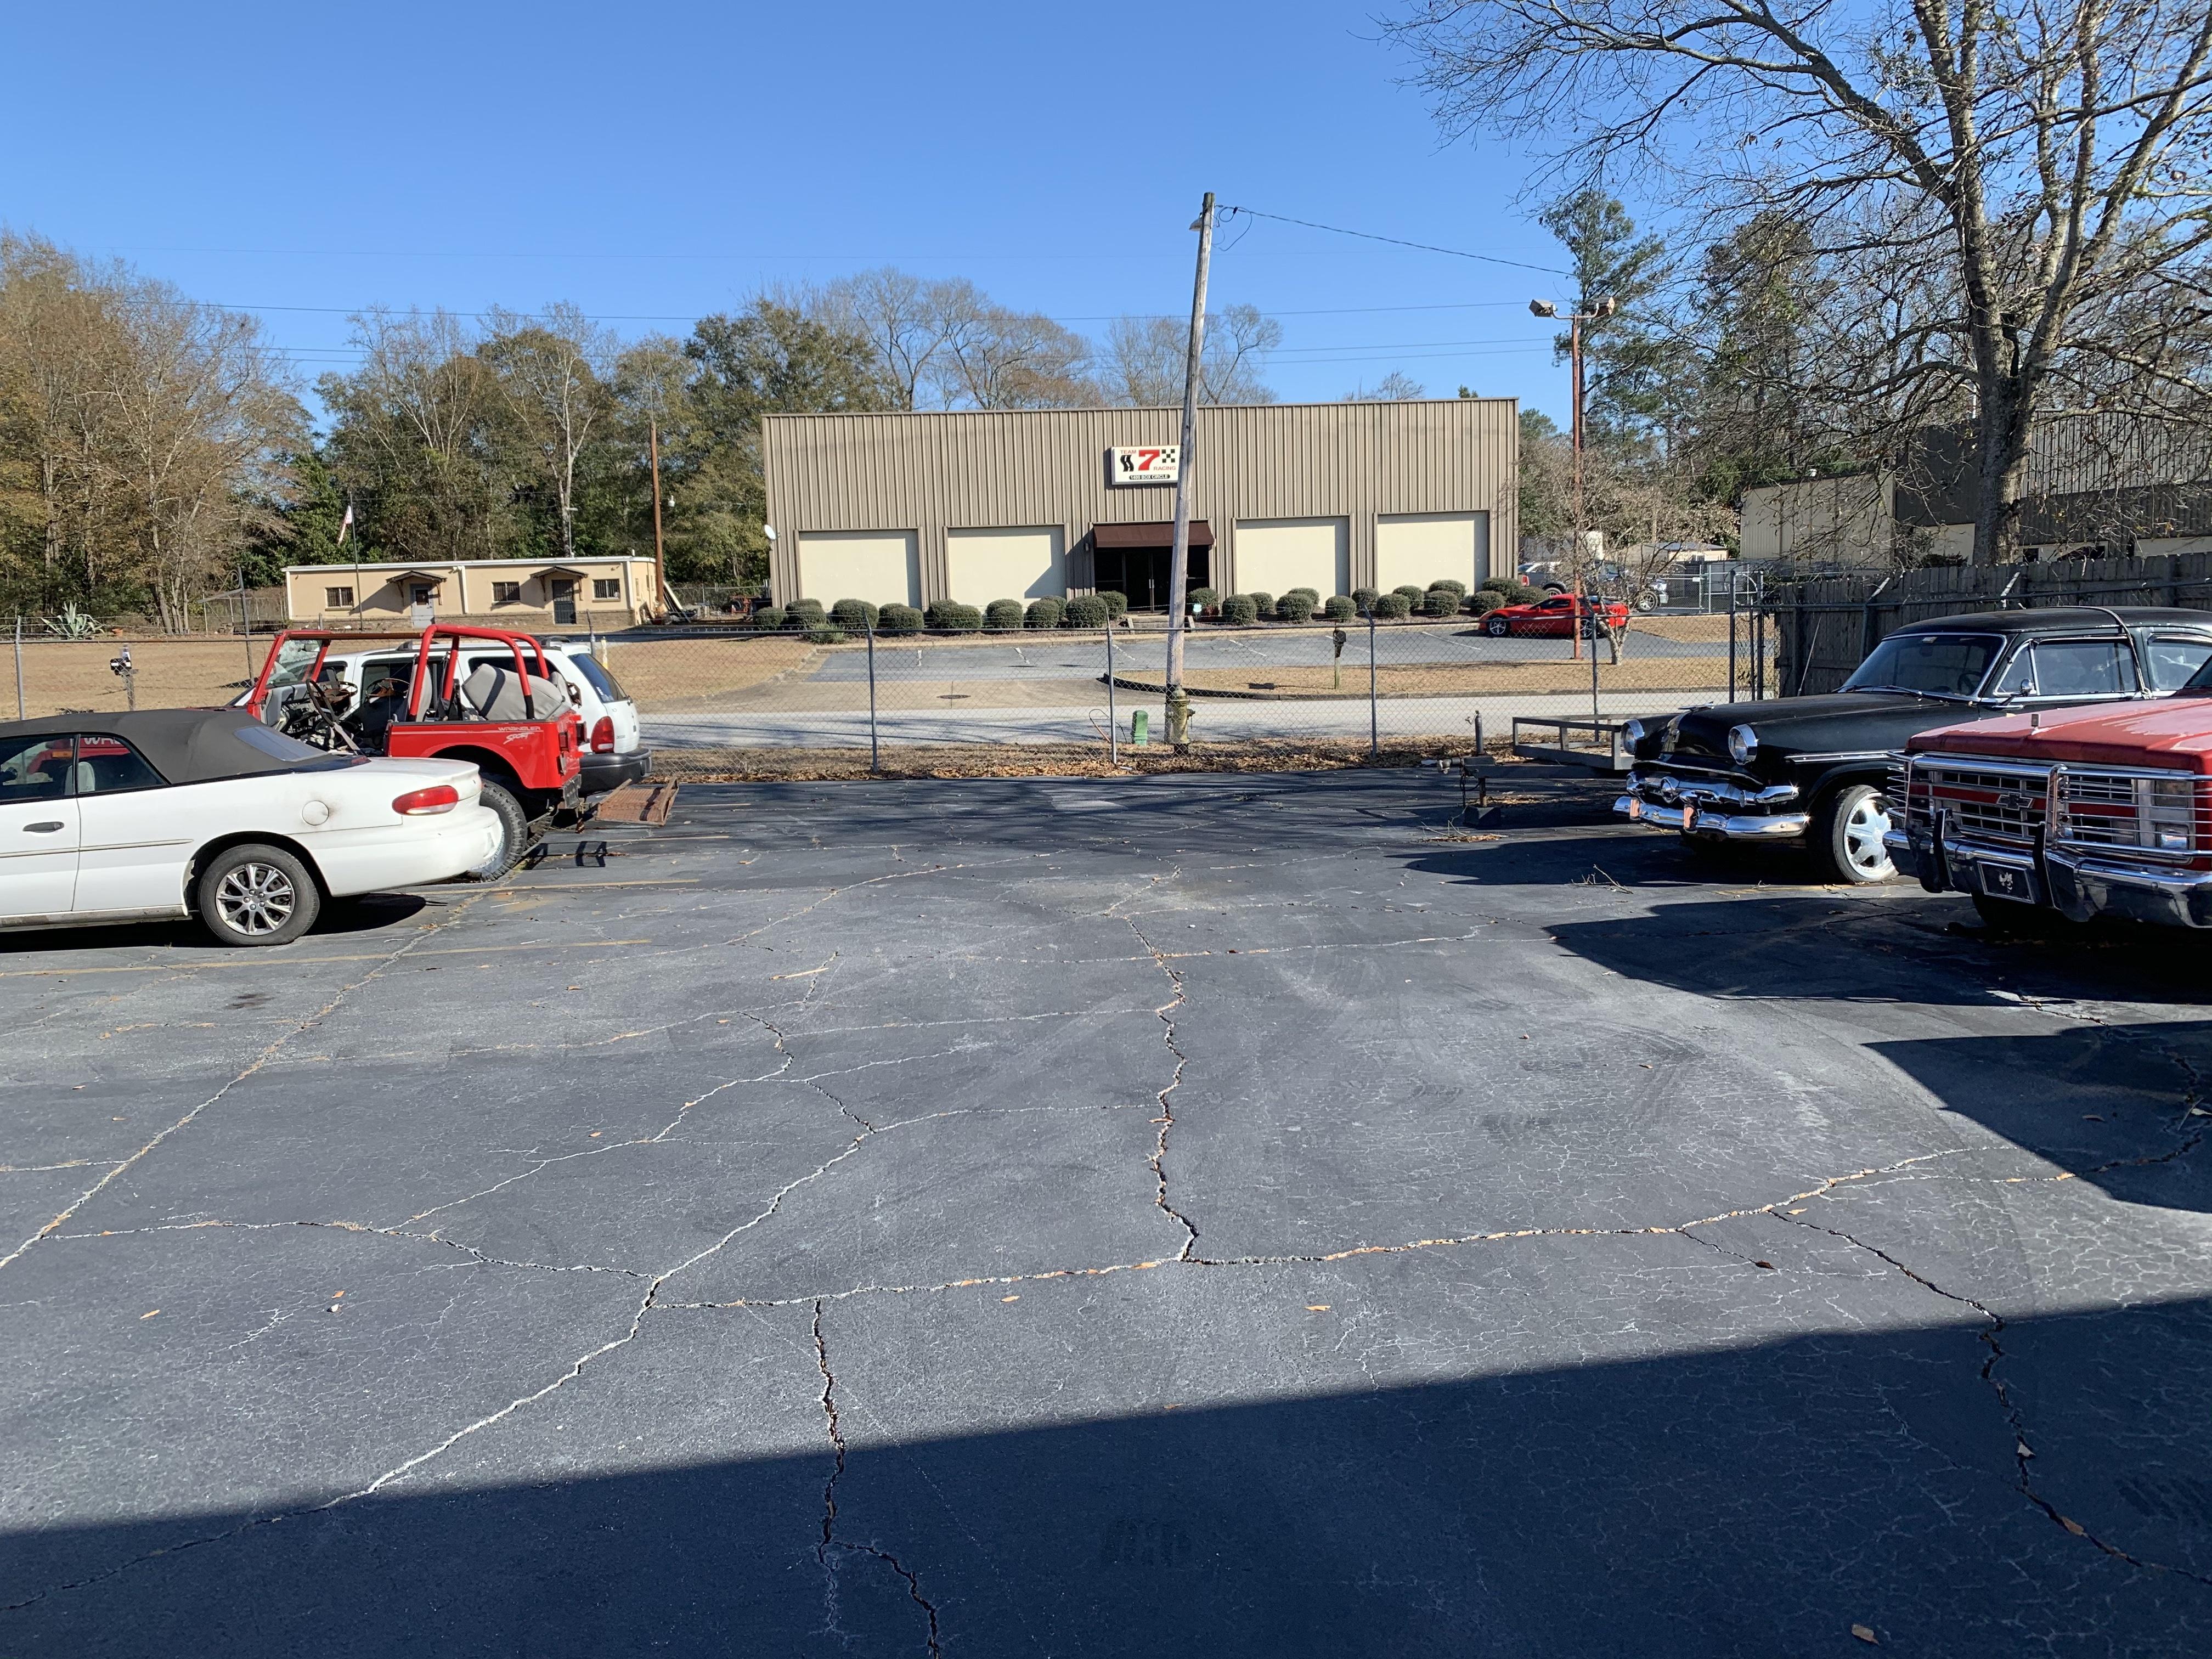 Parking spots in Columbus, GA